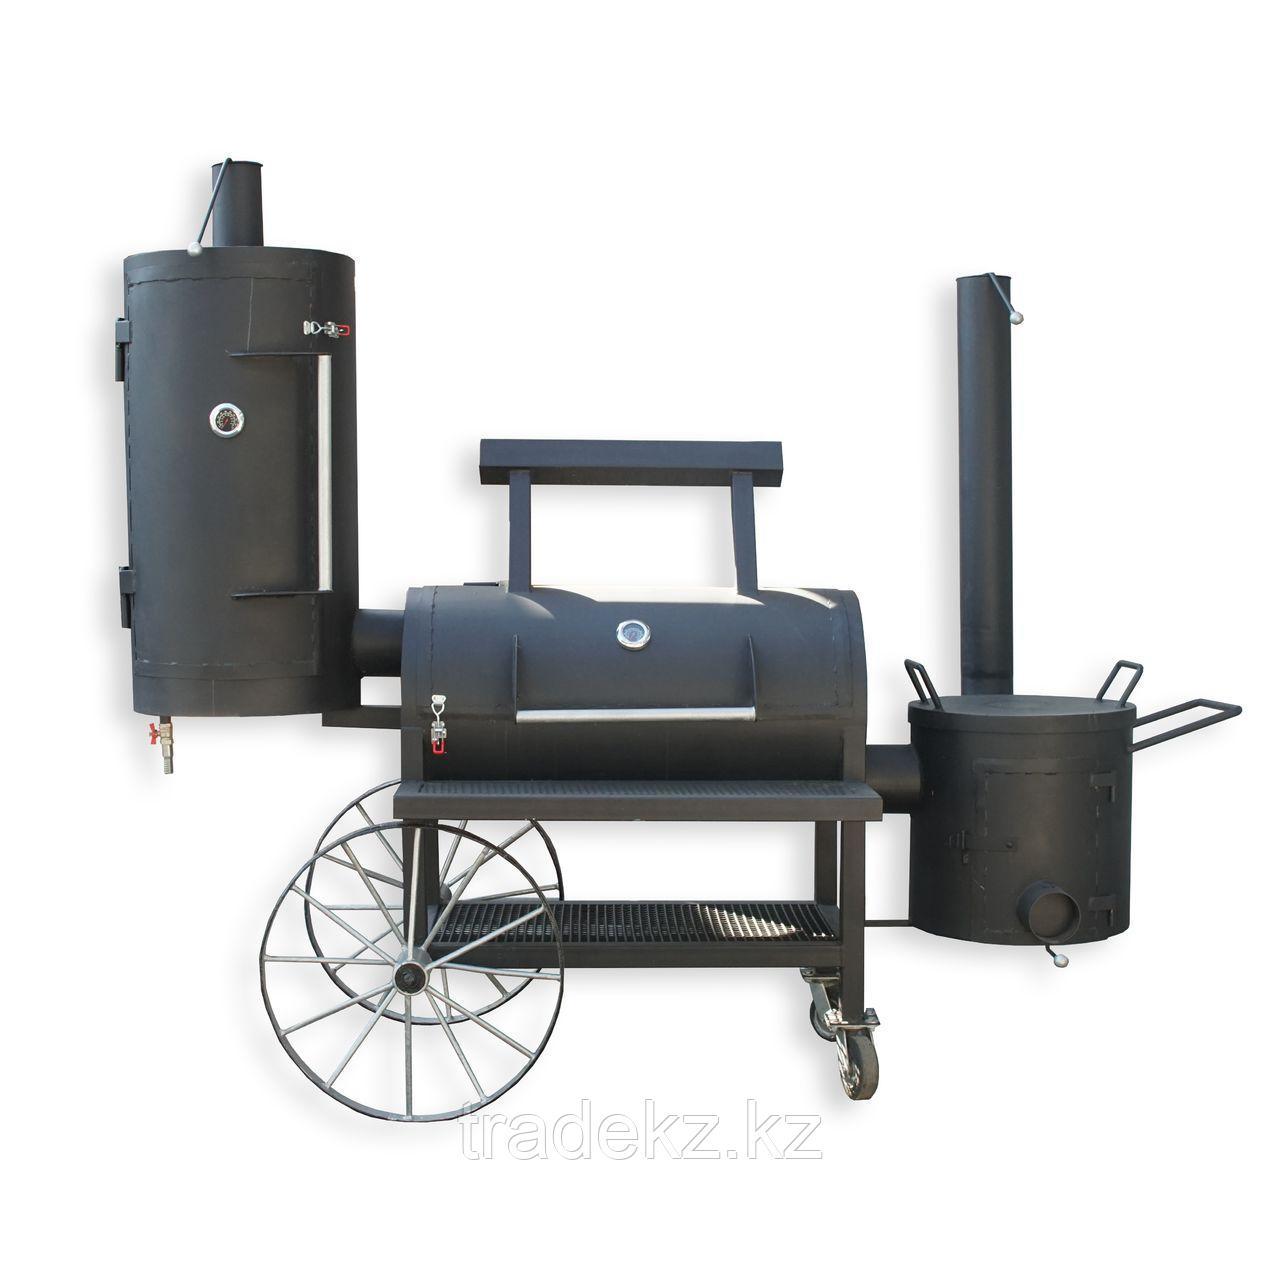 "Гриль - коптильня - смокер Smoker 3 в 1 ""GrillHouse"""